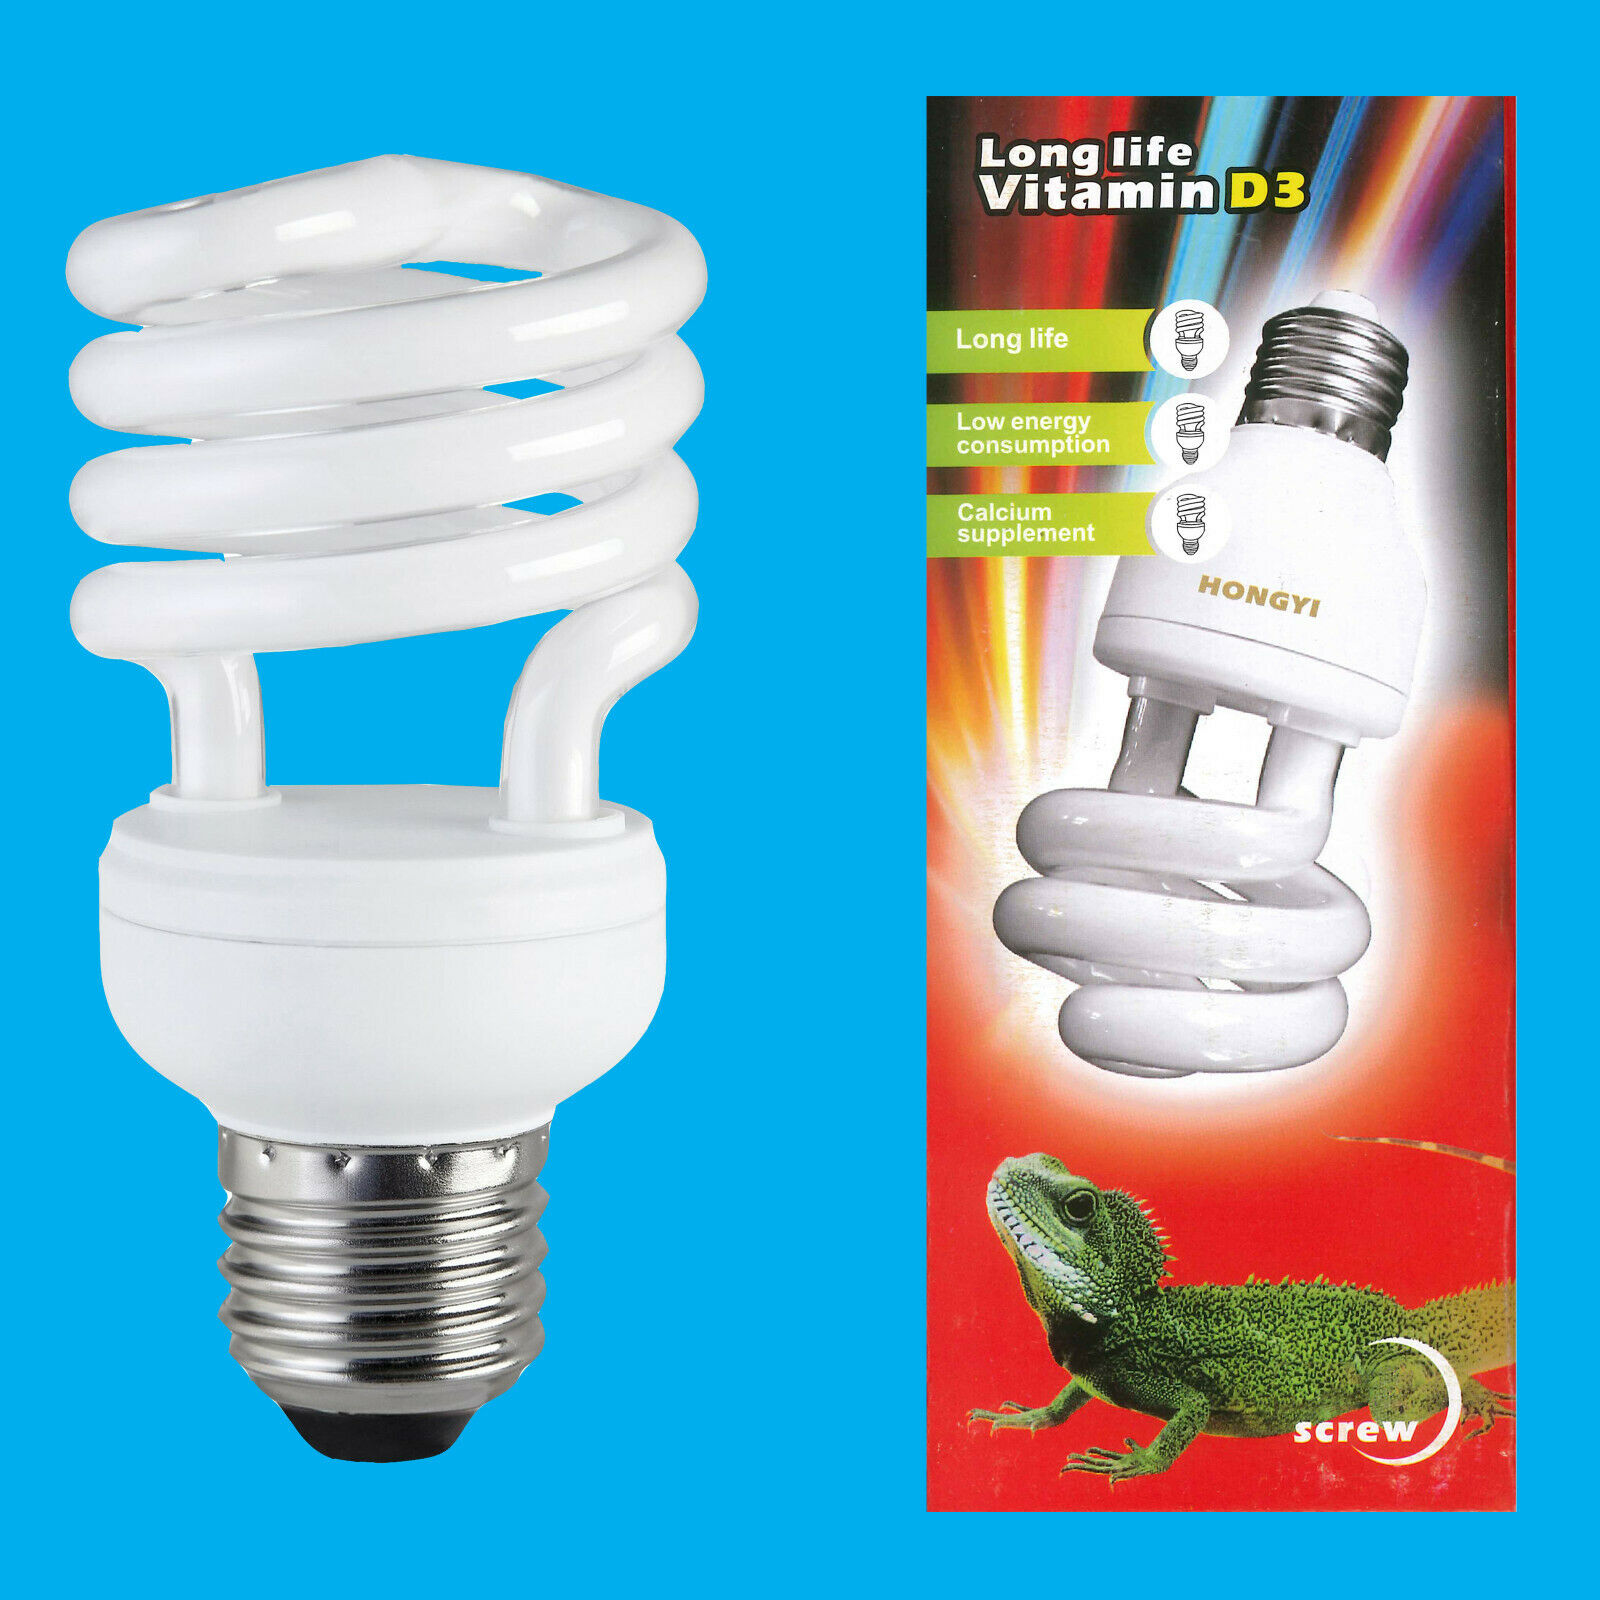 10x 13W CFL Spiral Vitamin D3 UVB 10.0 Plant, Reptilian E27 Screw Light Bulb